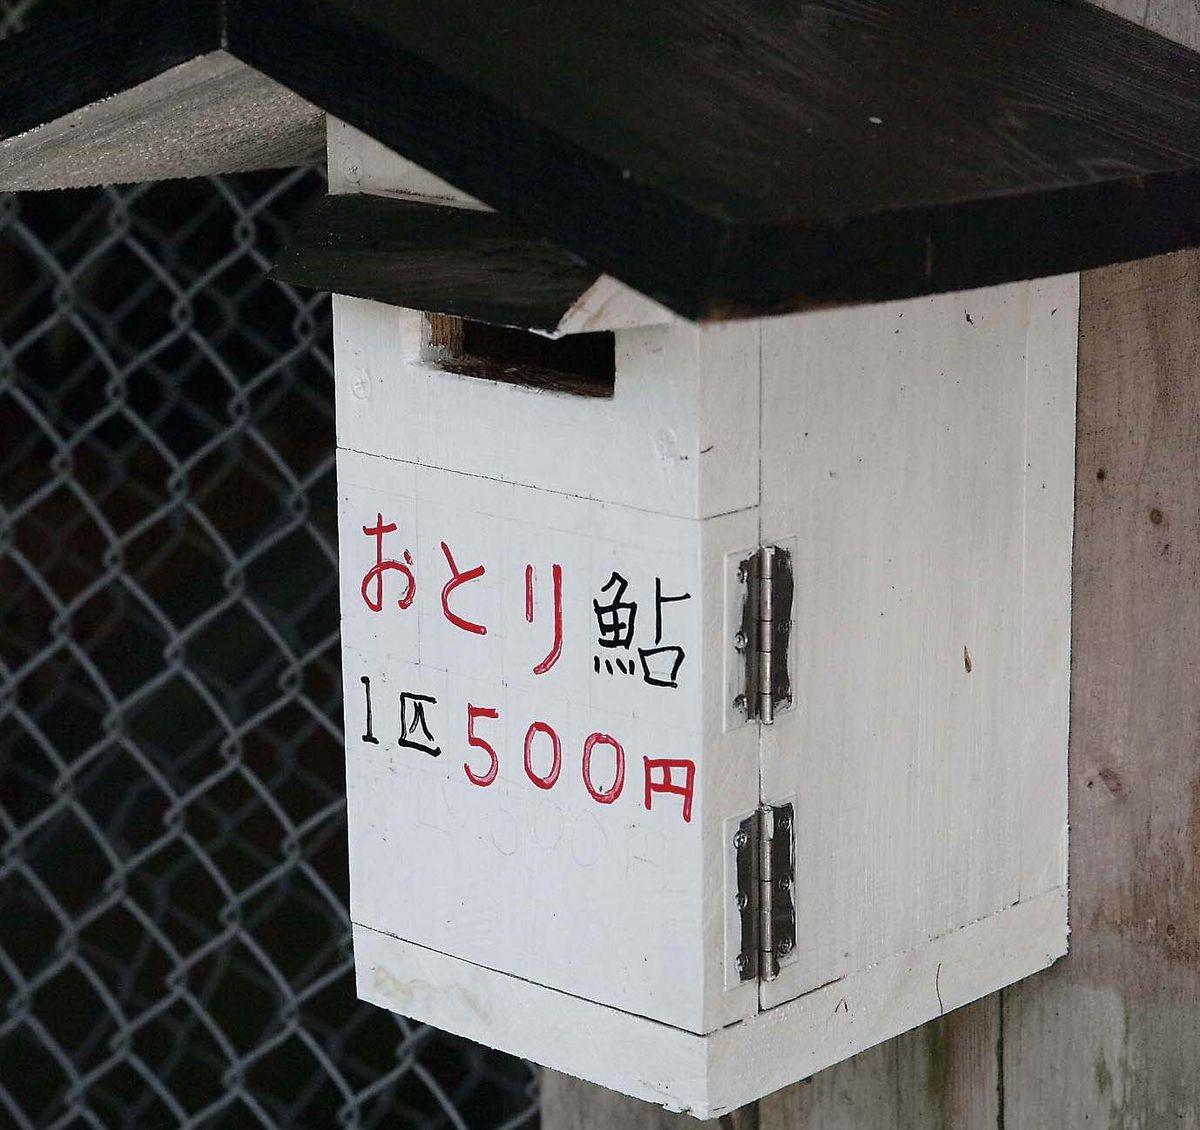 028-031kozagawa-metaking_cs6 (14)